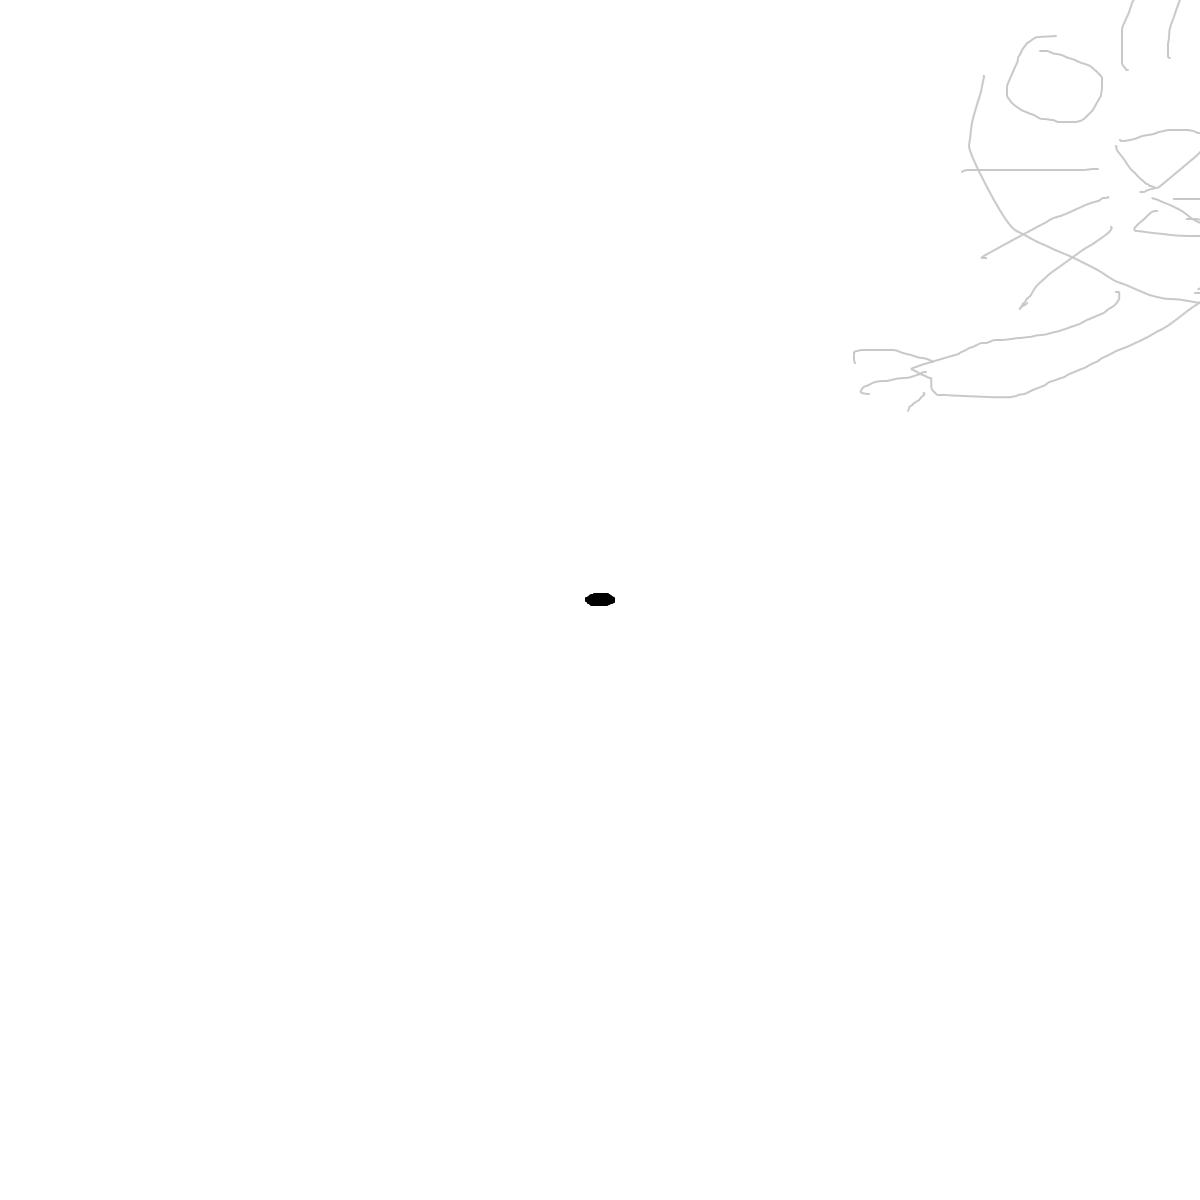 BAAAM drawing#7615 lat:39.4477767944335940lng: -31.2399349212646500